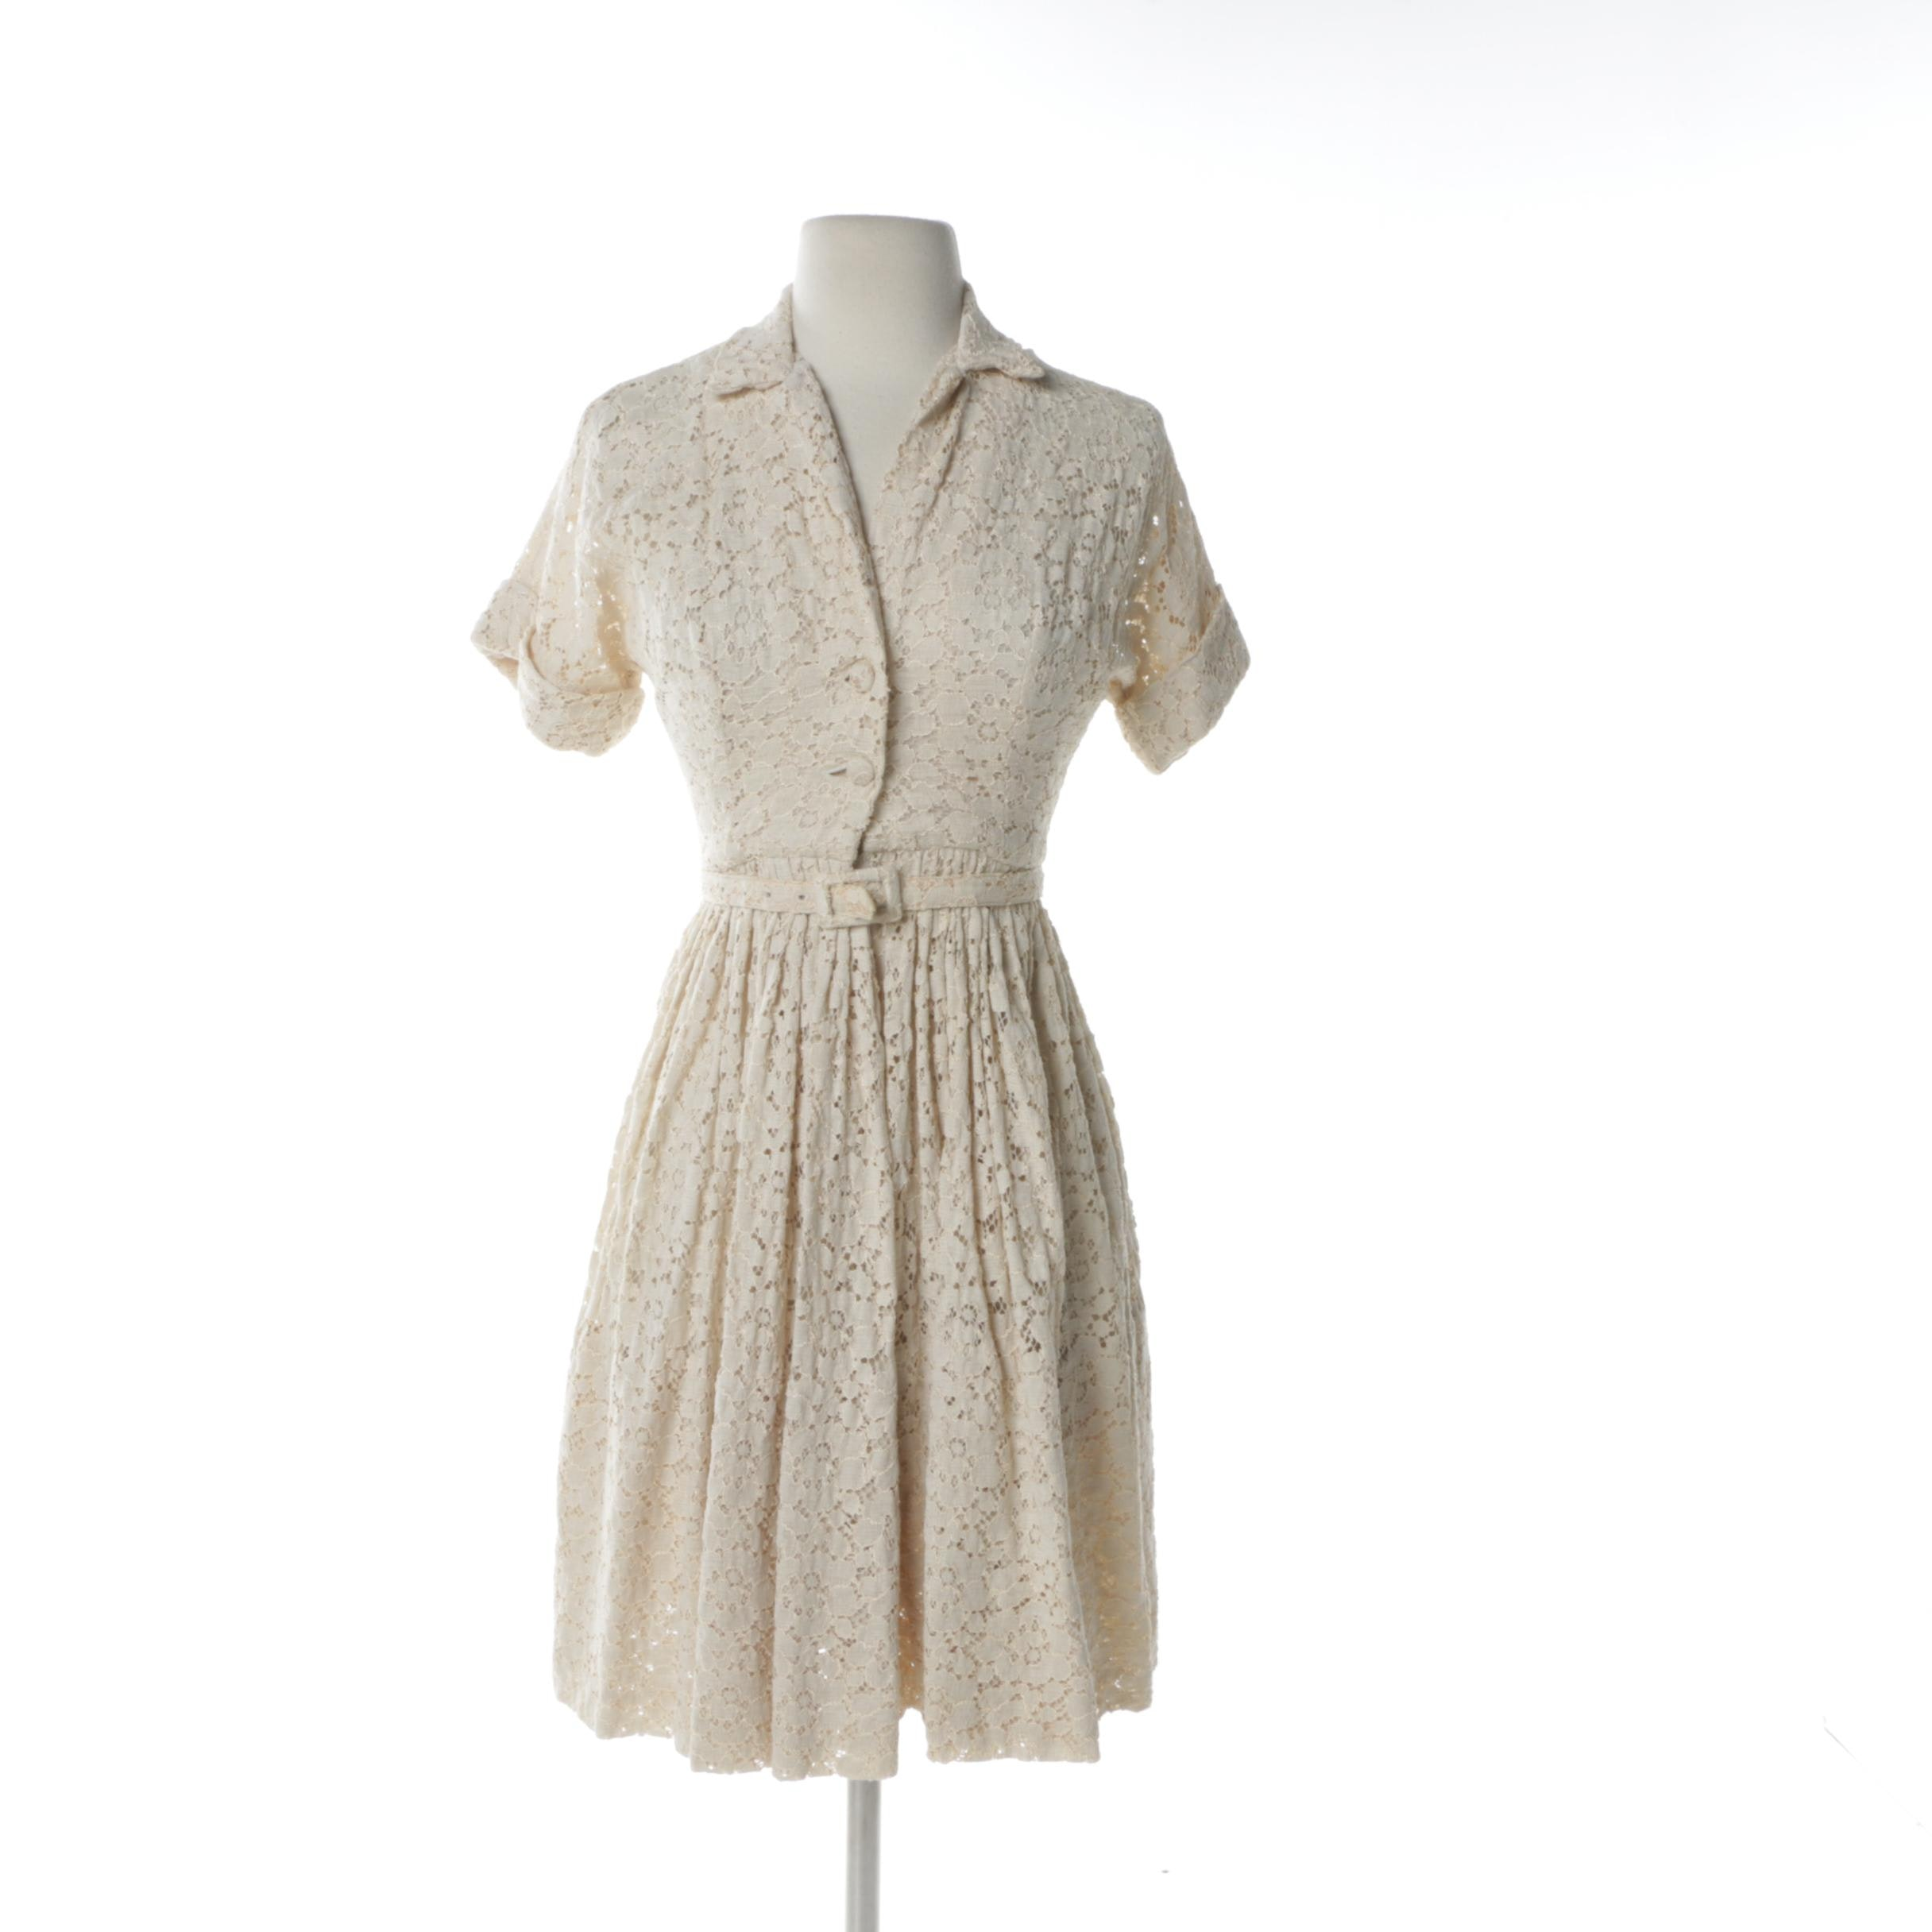 1950s Neiman Marcus Ivory Lace Tea Dress